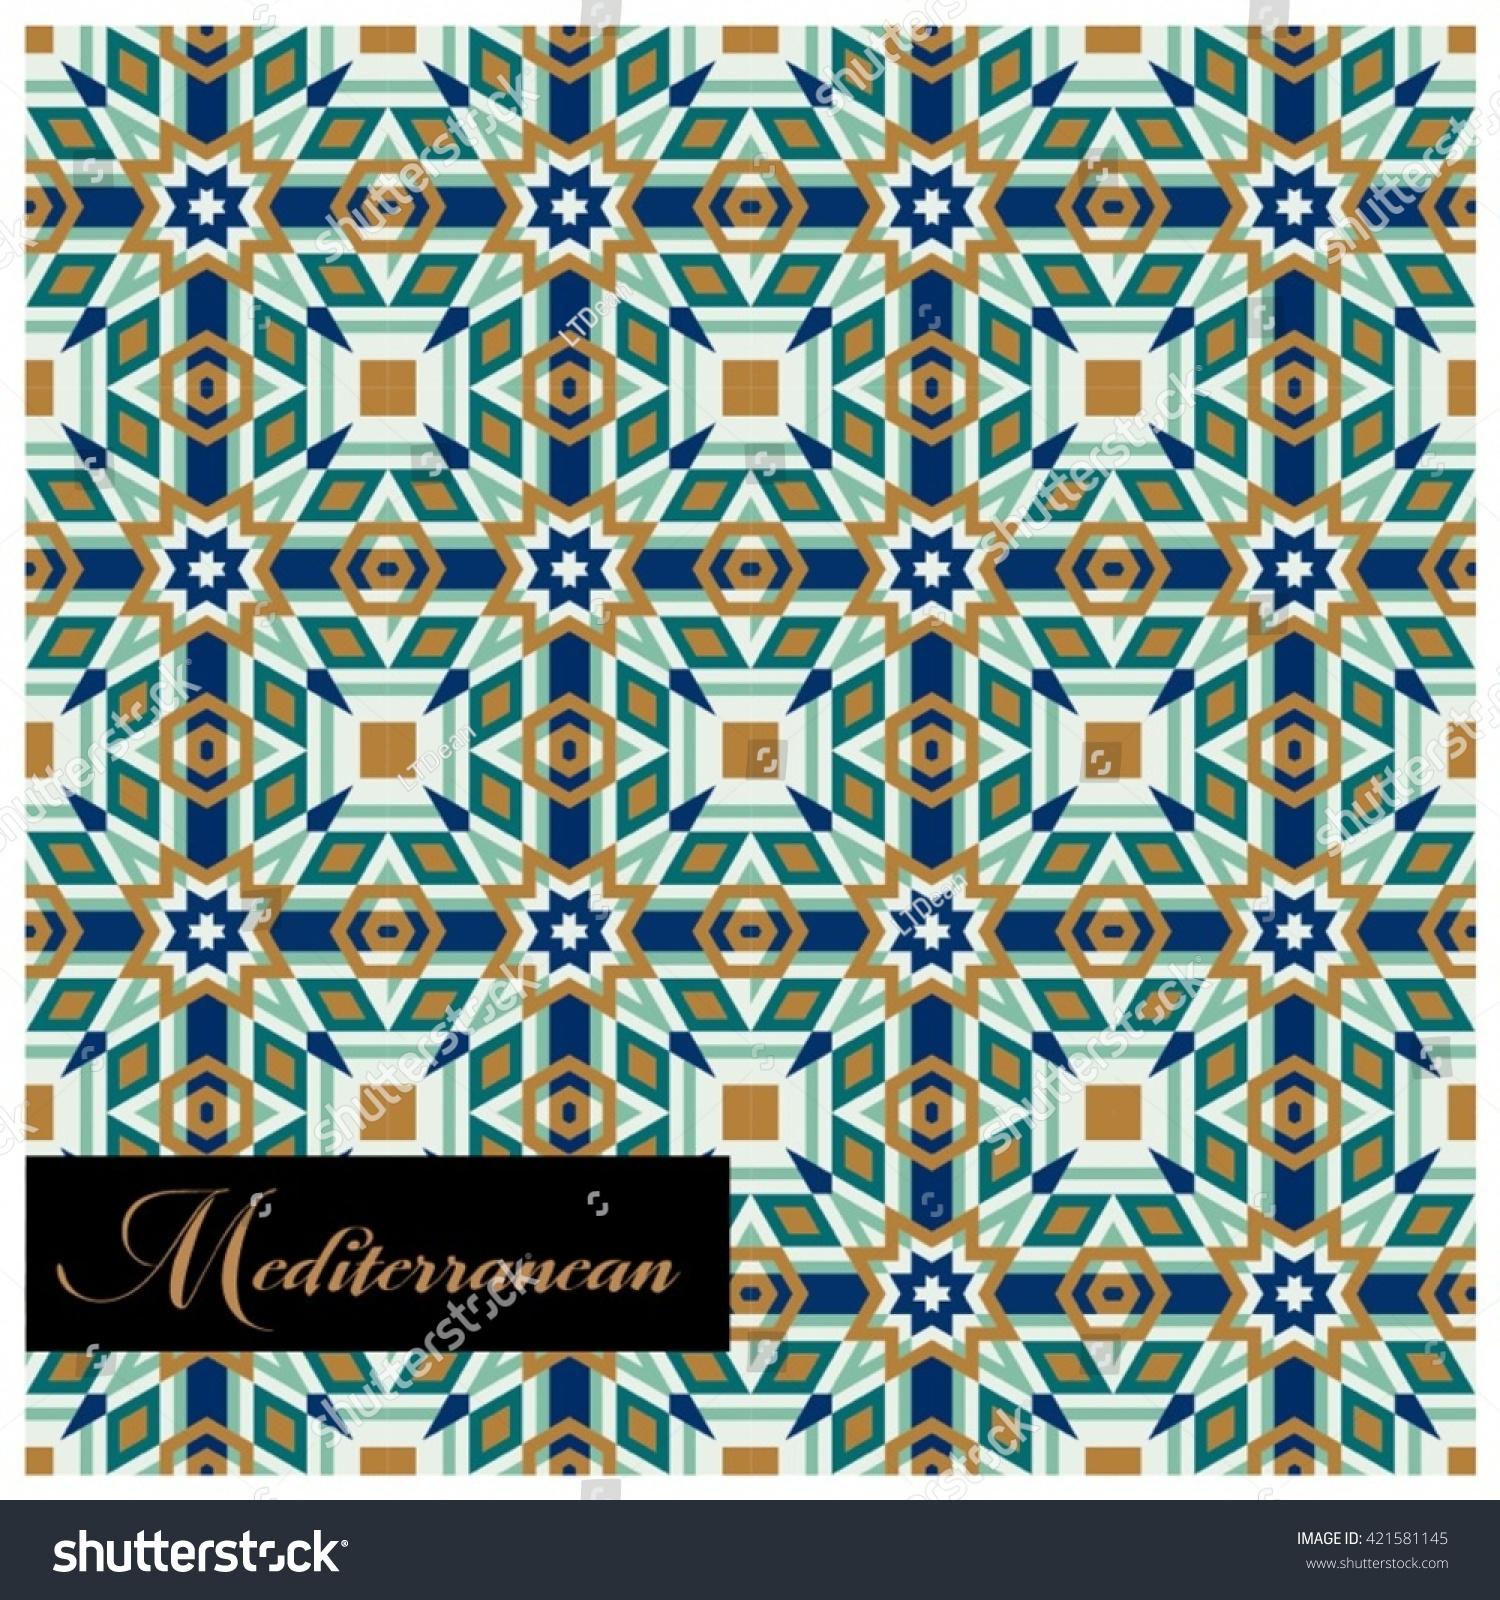 Classic Mediterranean Inspired Tile Floor Seamless Stock Vector ...